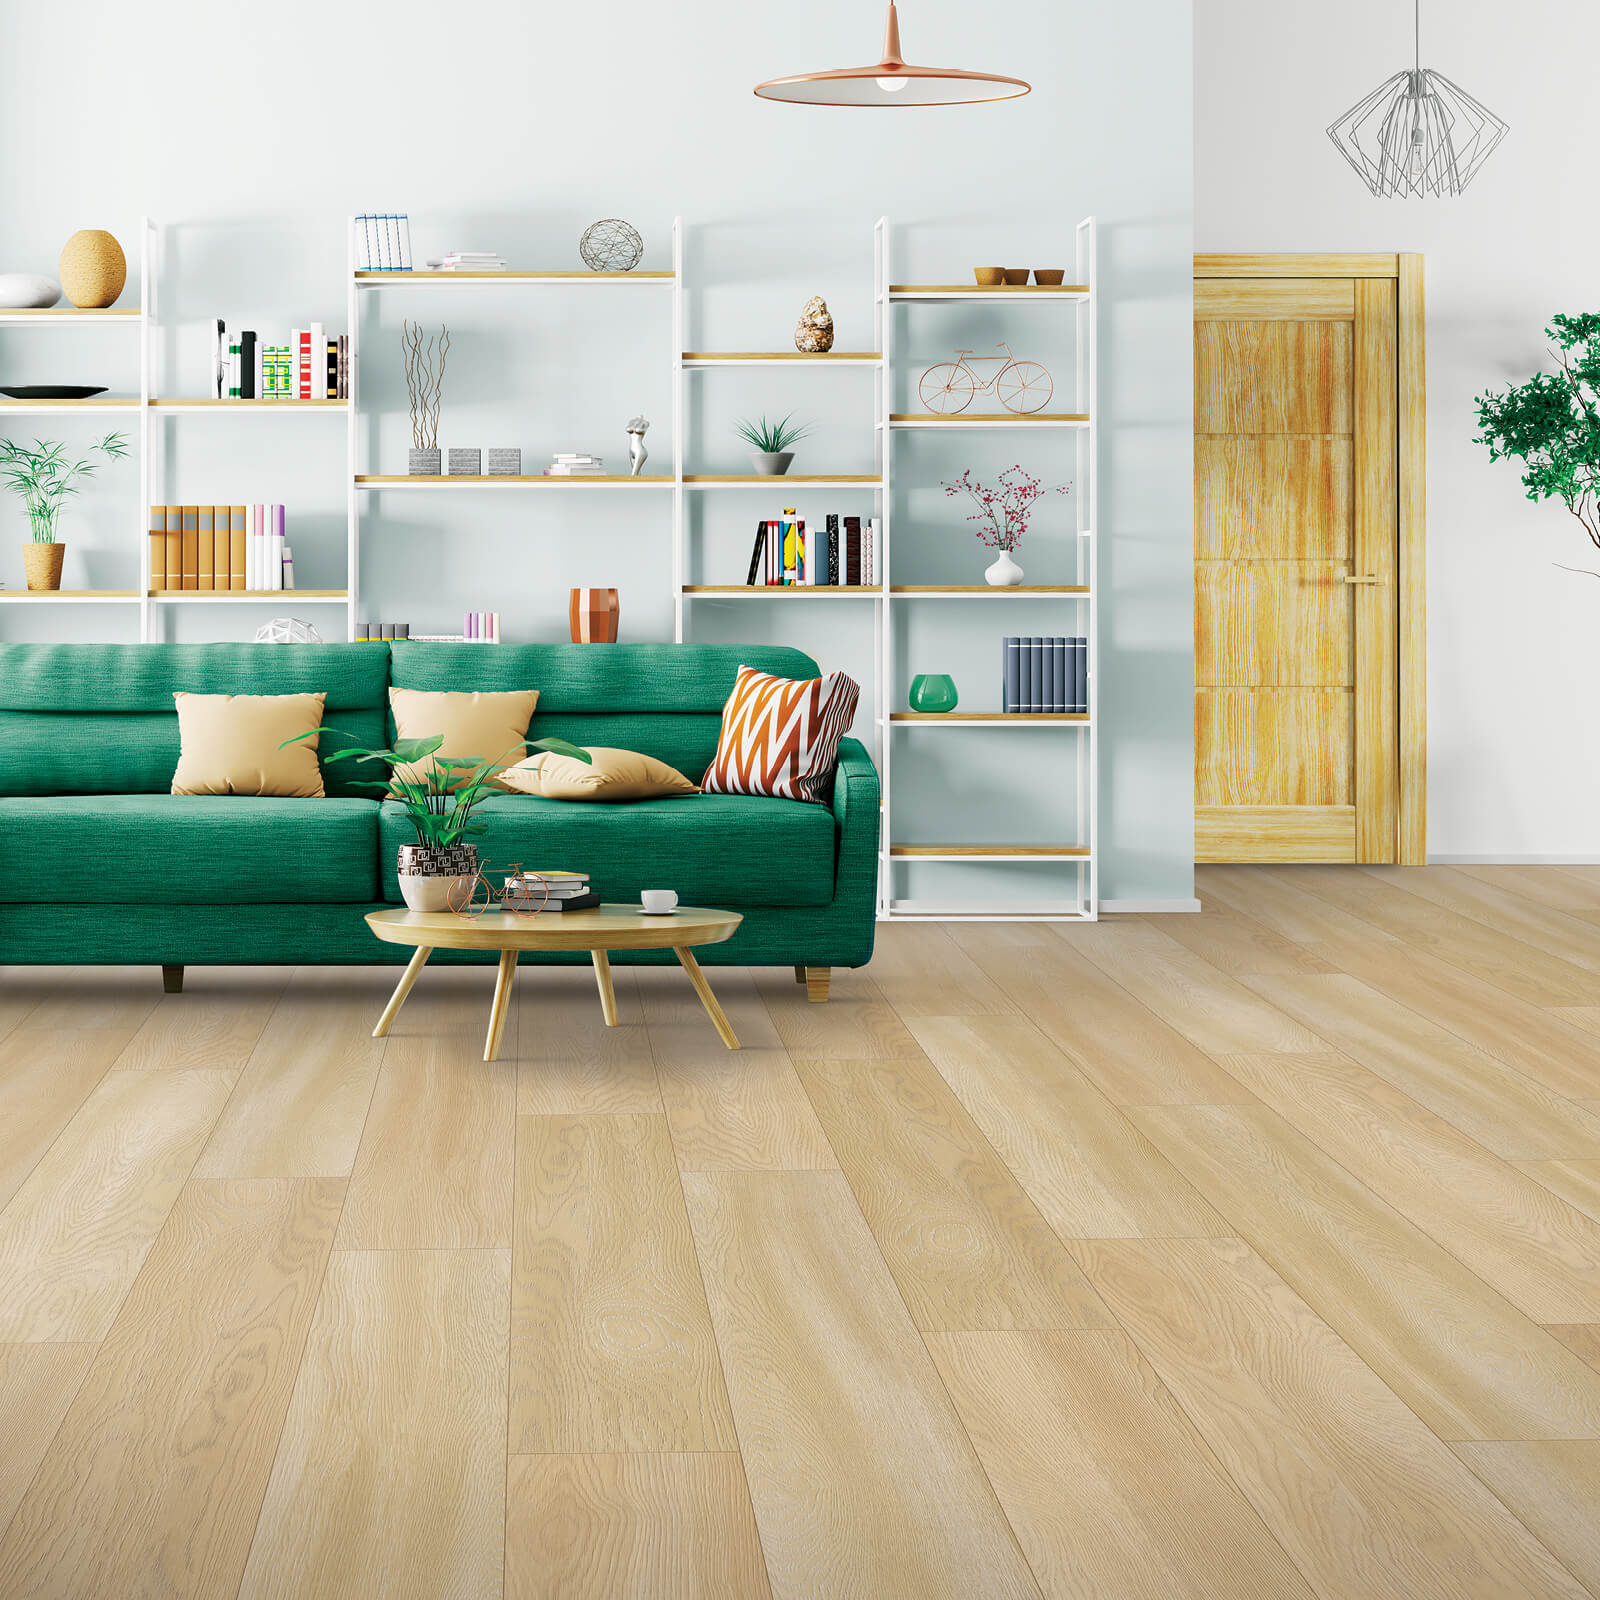 Laminate flooring | Masters And Petersens Flooring